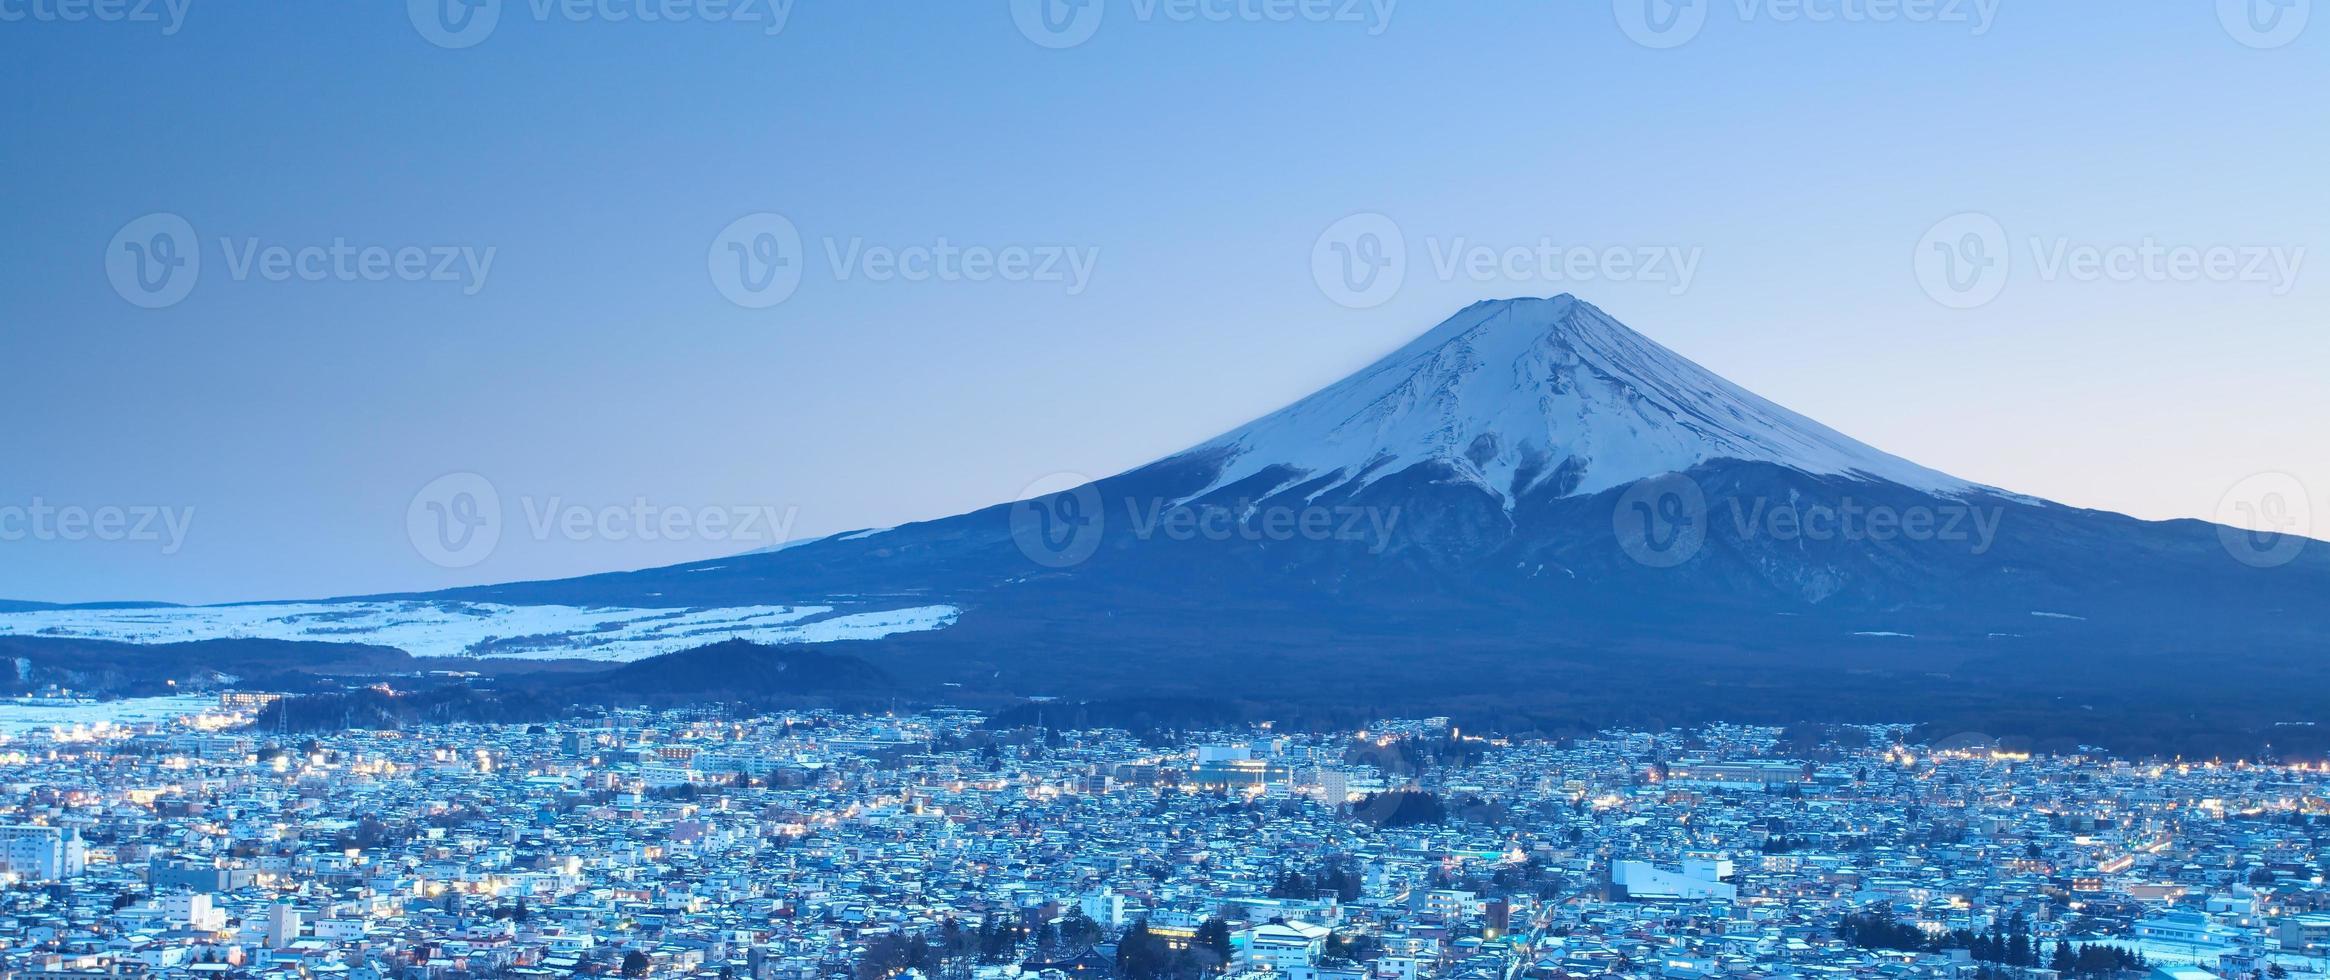 mountain fuji in winter from Fujiyoshida town photo